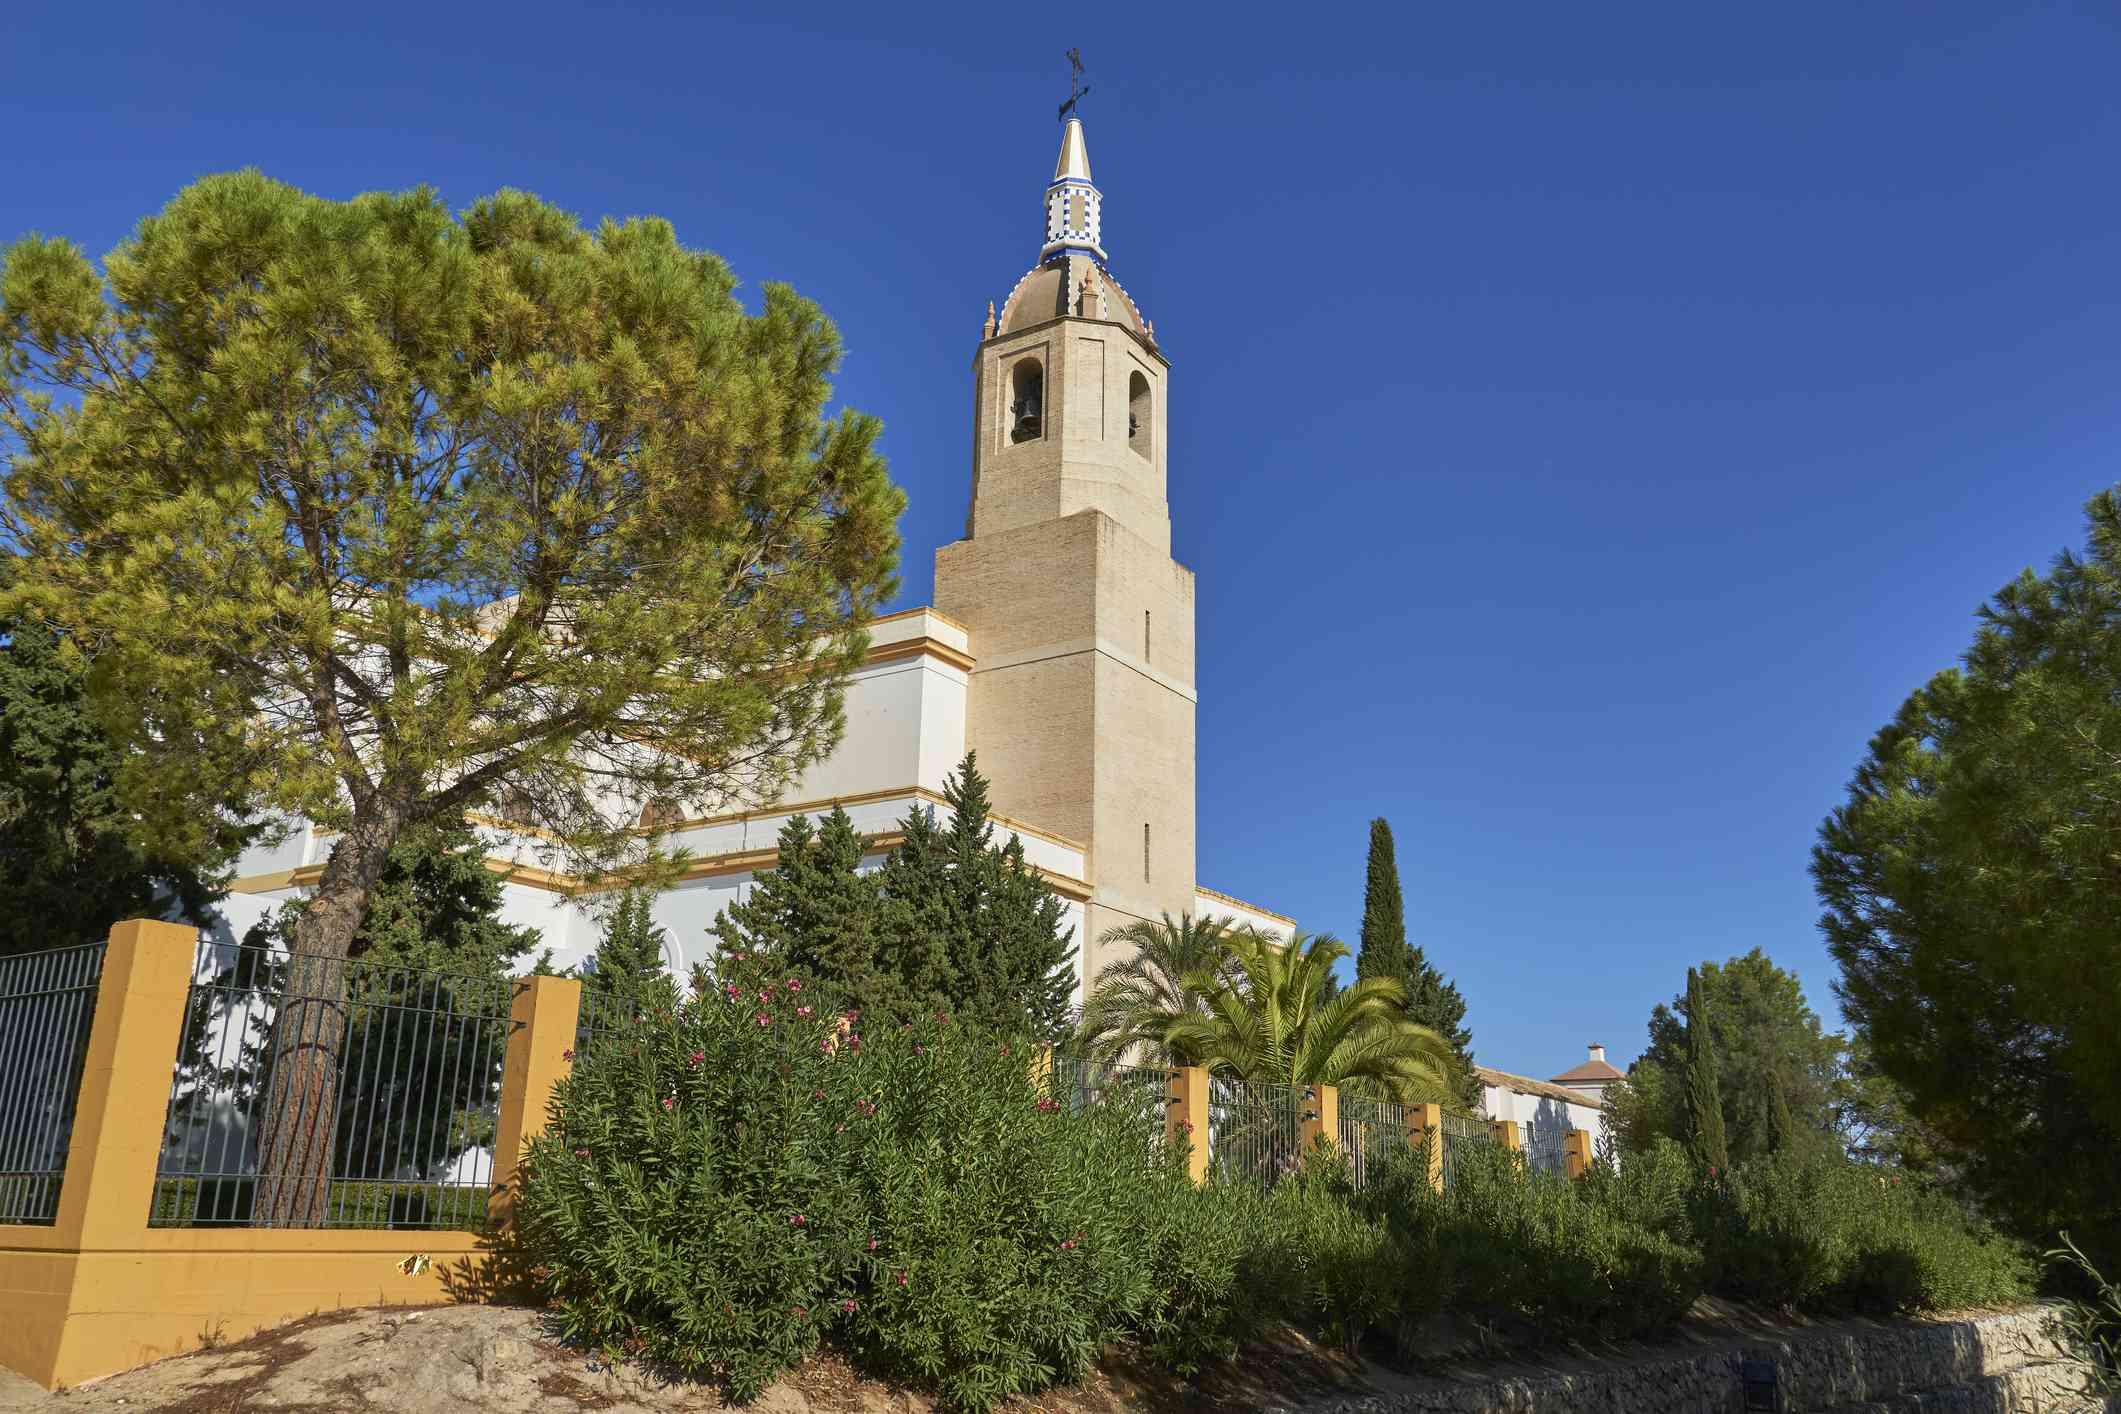 Church of our Lady of Virtudes in Cazalla de la Sierra, province of Seville. Spain